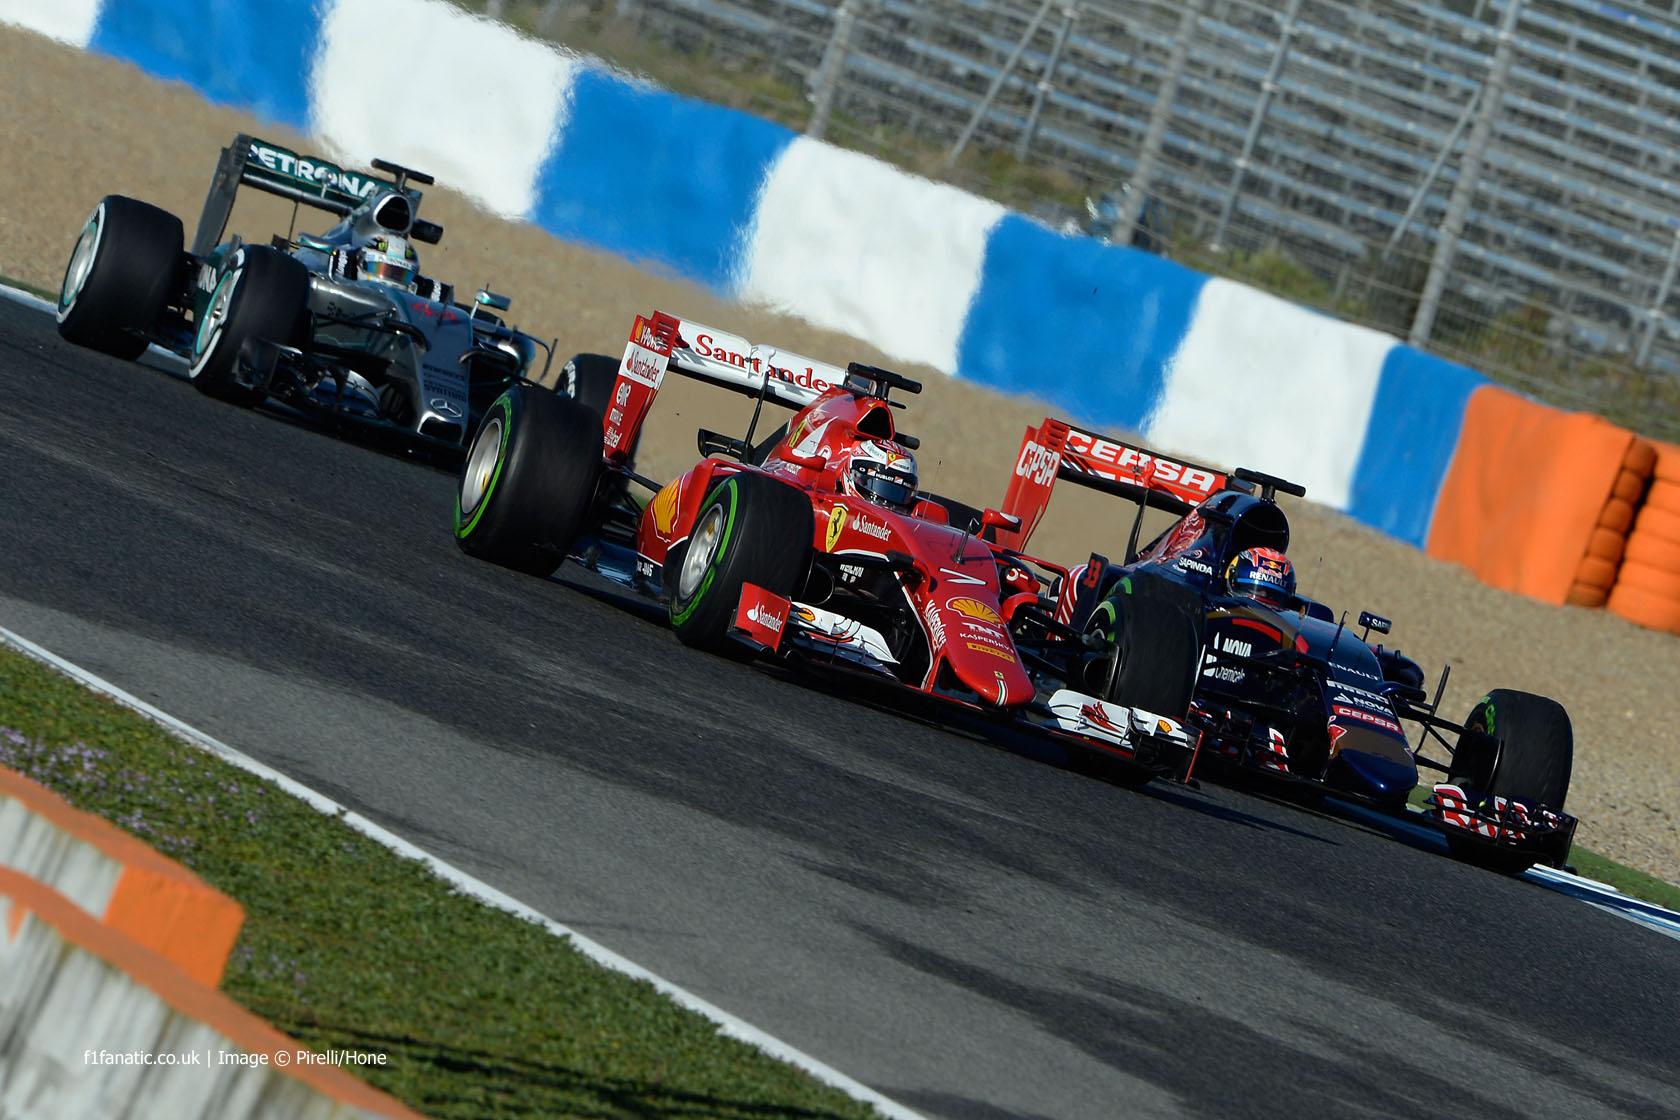 Kimi Raikkonen, Max Verstappen, Lewis Hamilton, Circuito de Jerez, 2015